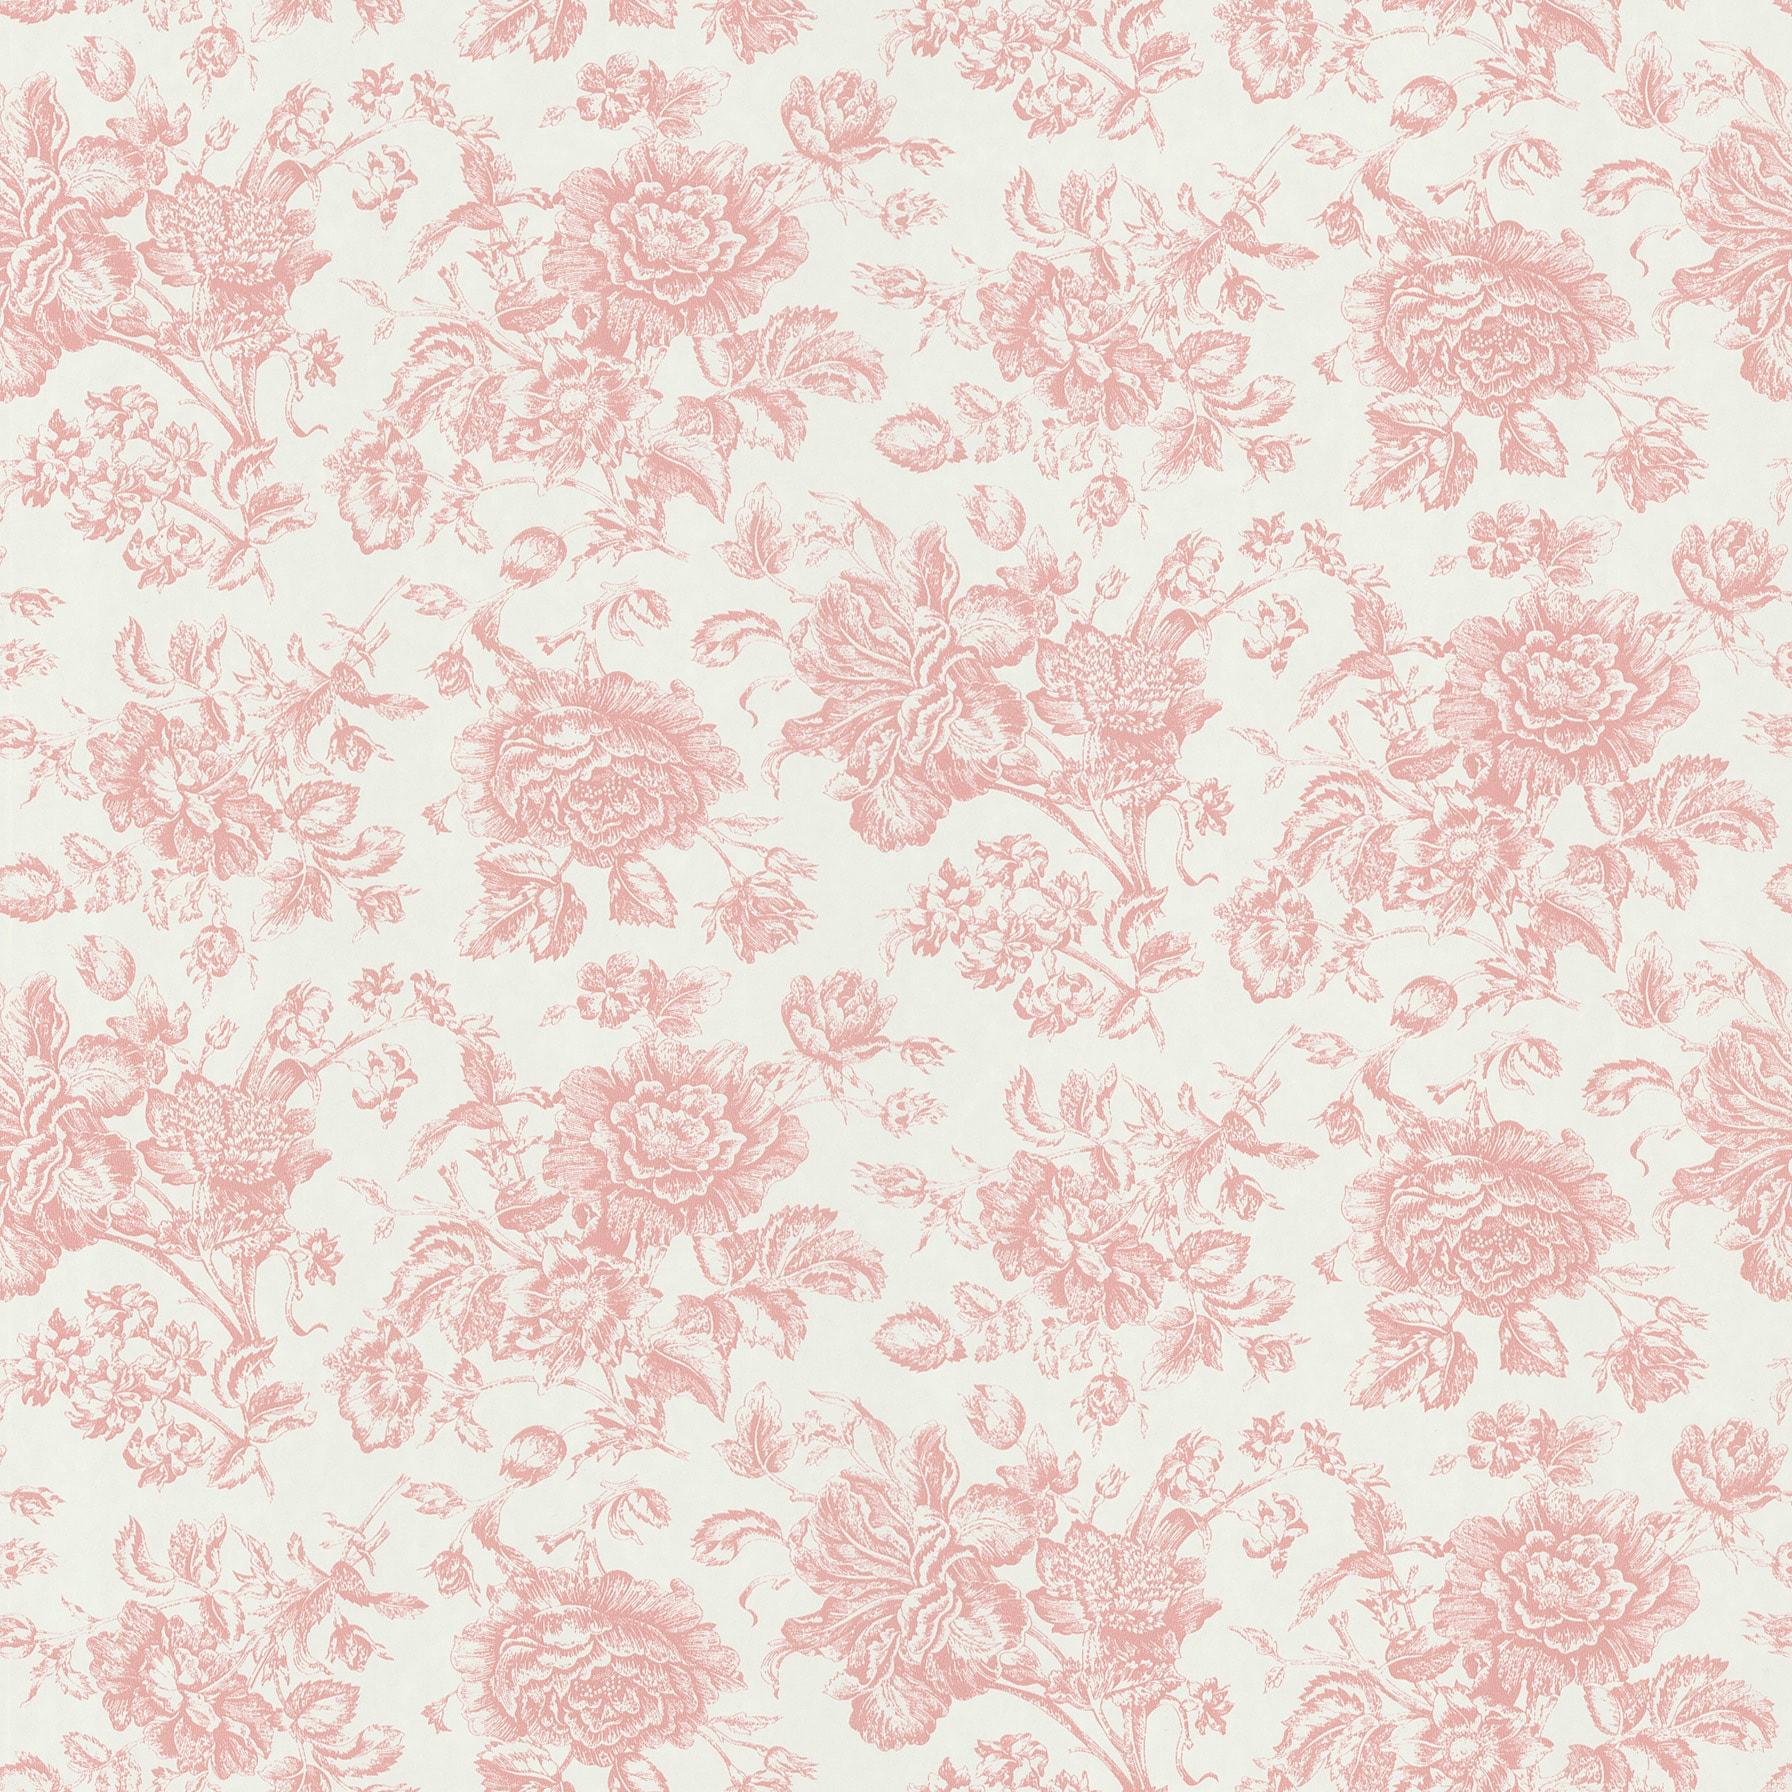 Shop Brewster Pink Floral Toile Wallpaper Overstock 8116889